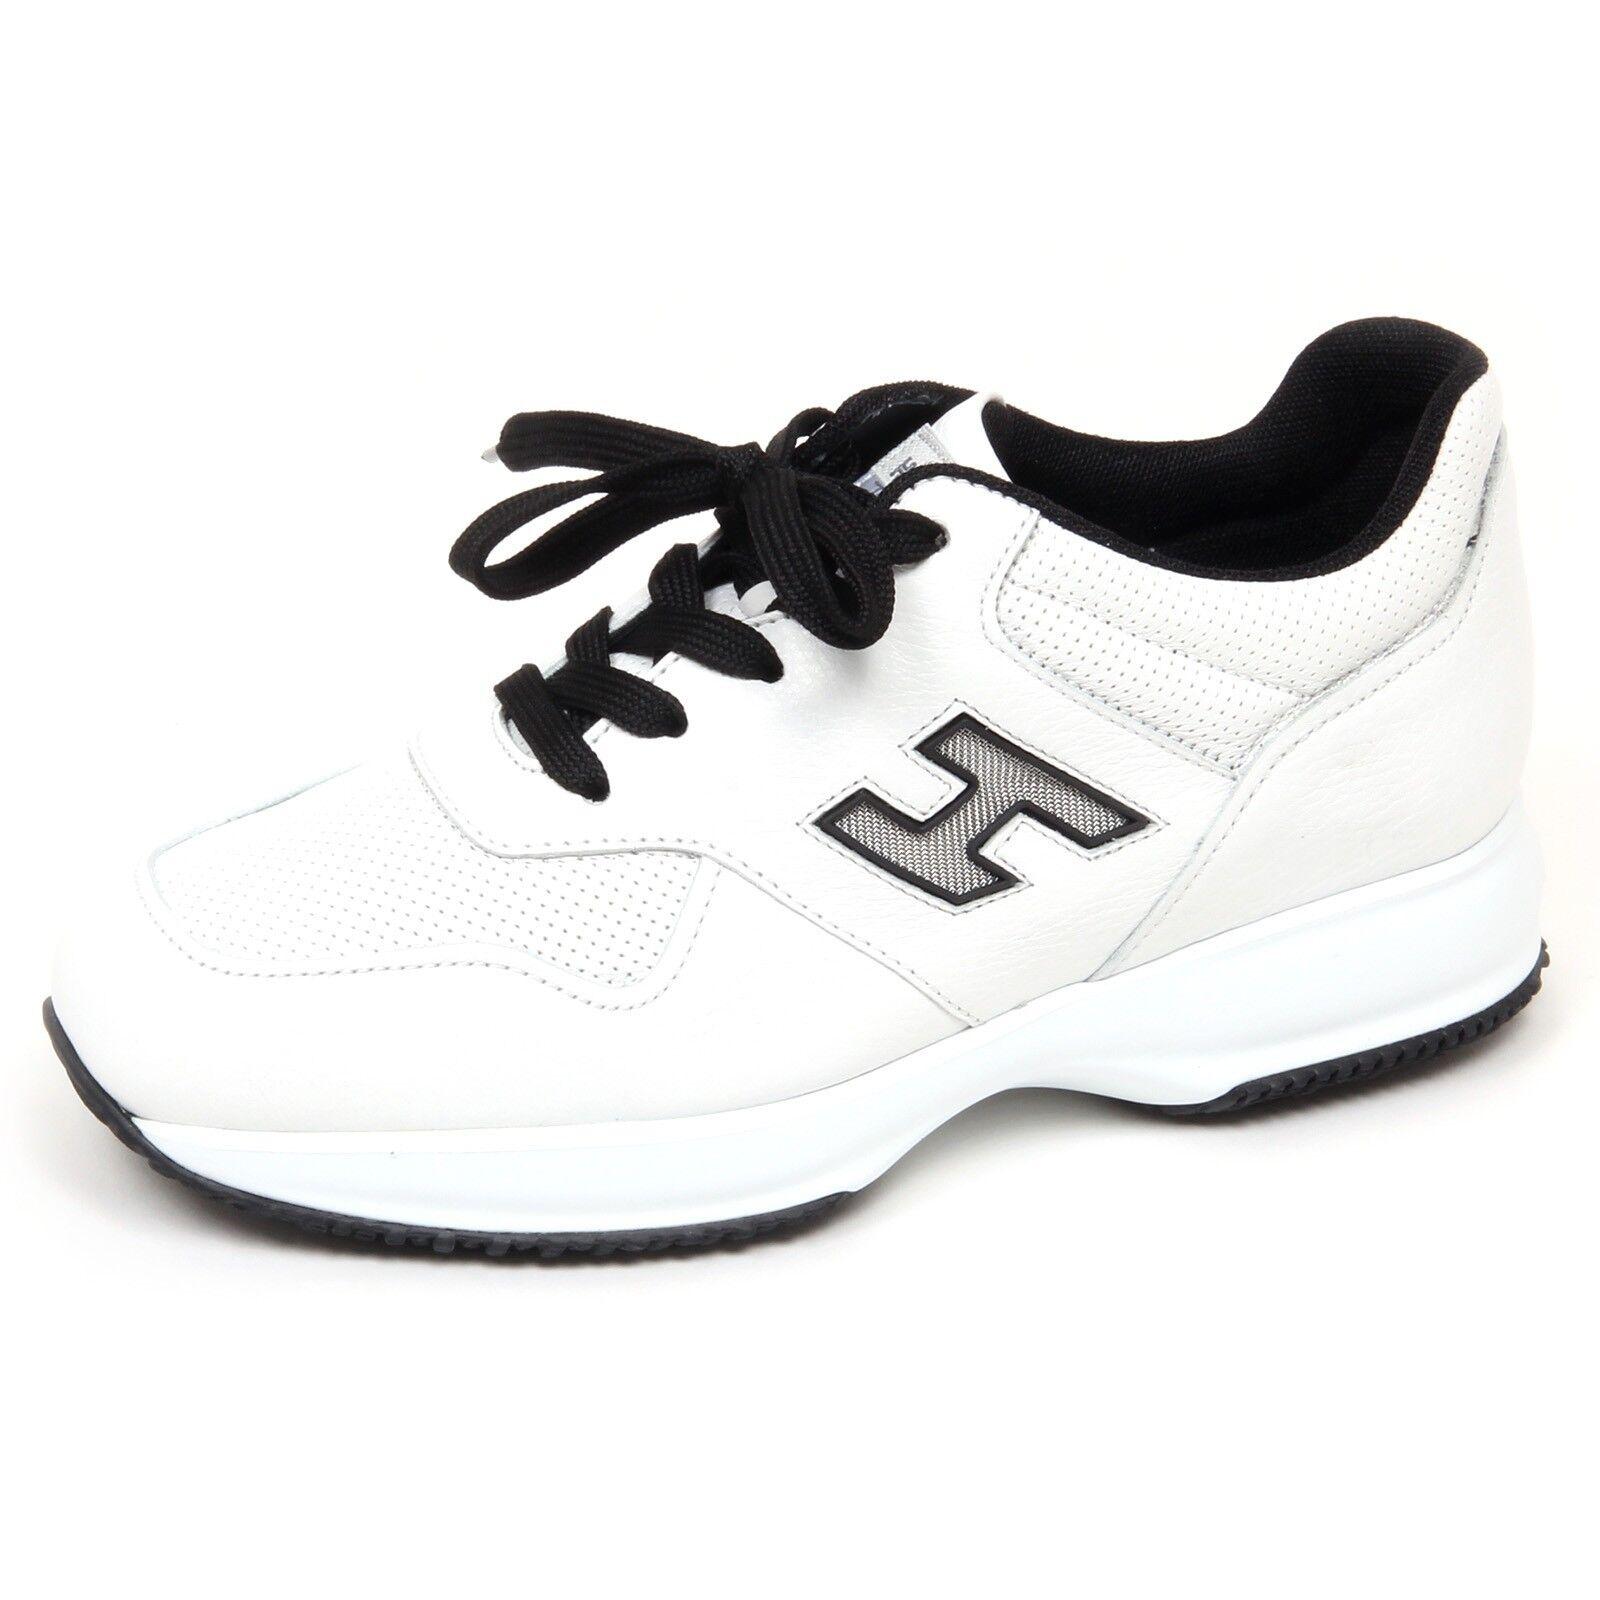 E9754 scarpe da ginnastica uomo bianca nero HOGAN INTERACTIVE scarpe H rete scarpe man   Arte Squisita    Sig/Sig Ra Scarpa